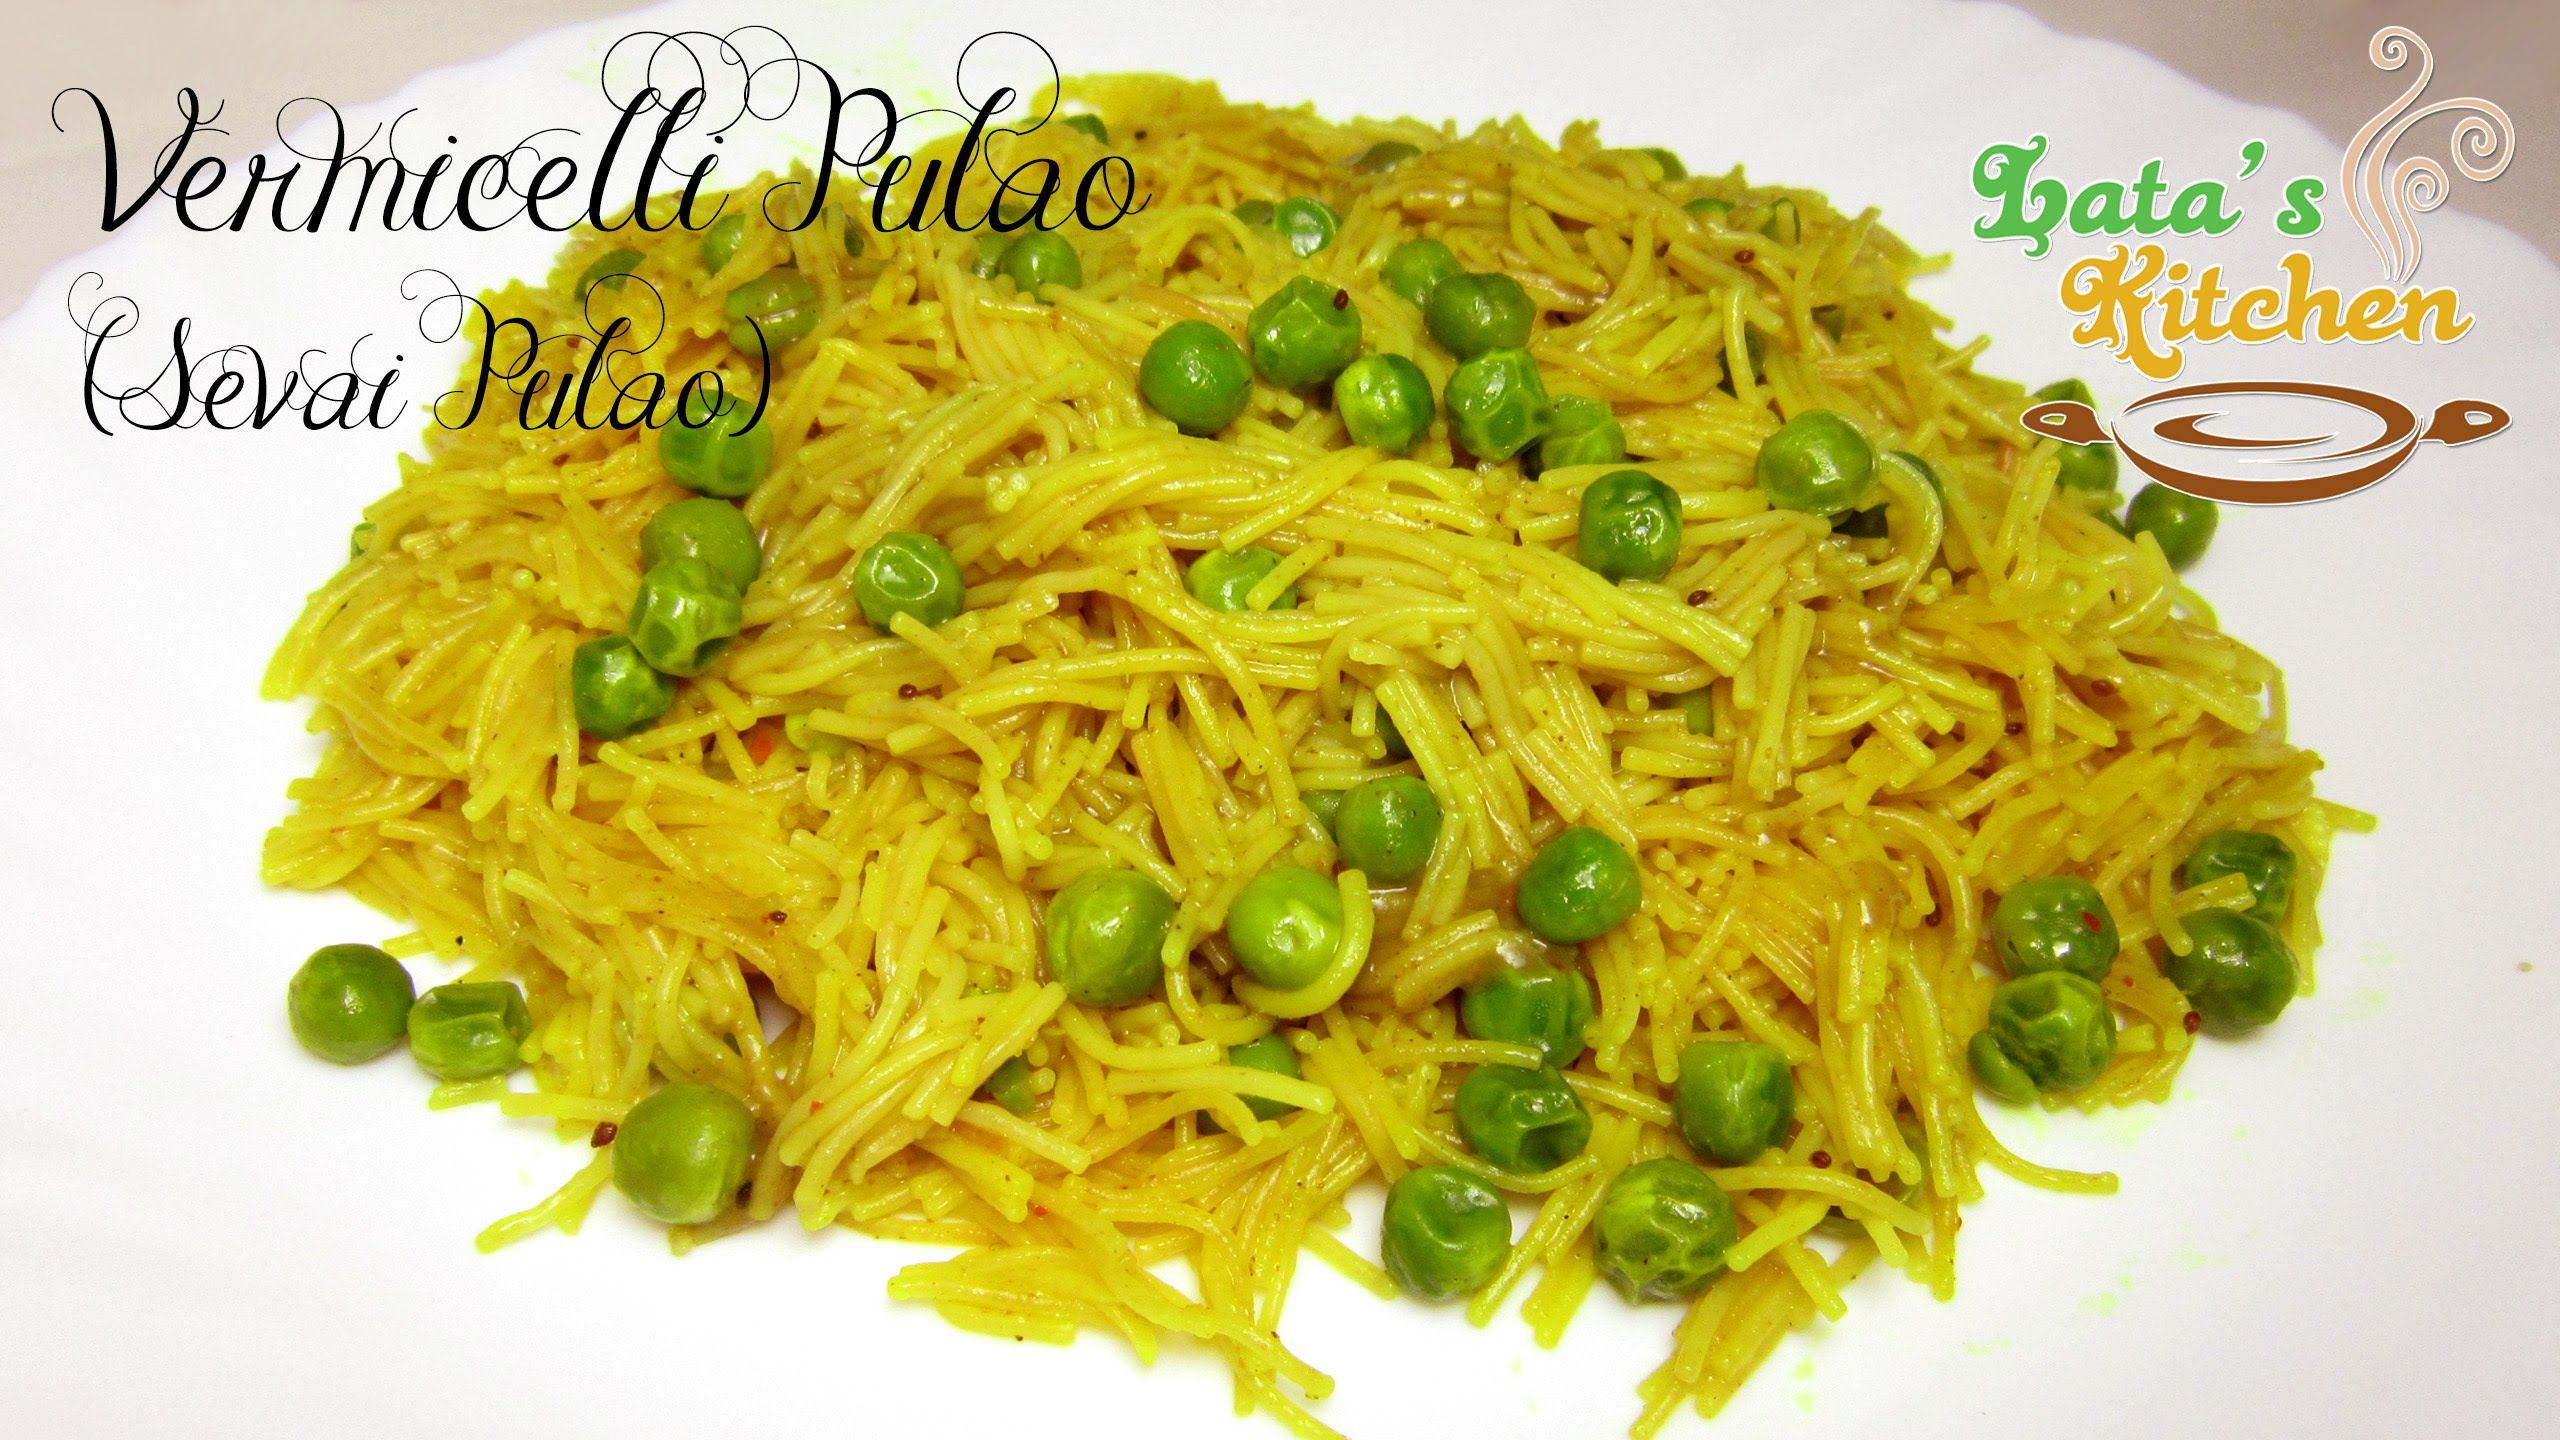 Vermicelli pulao semiya upma indian vegetarian recipe in hindi vermicelli pulao semiya upma indian vegetarian recipe in hindi with english subtitles forumfinder Image collections